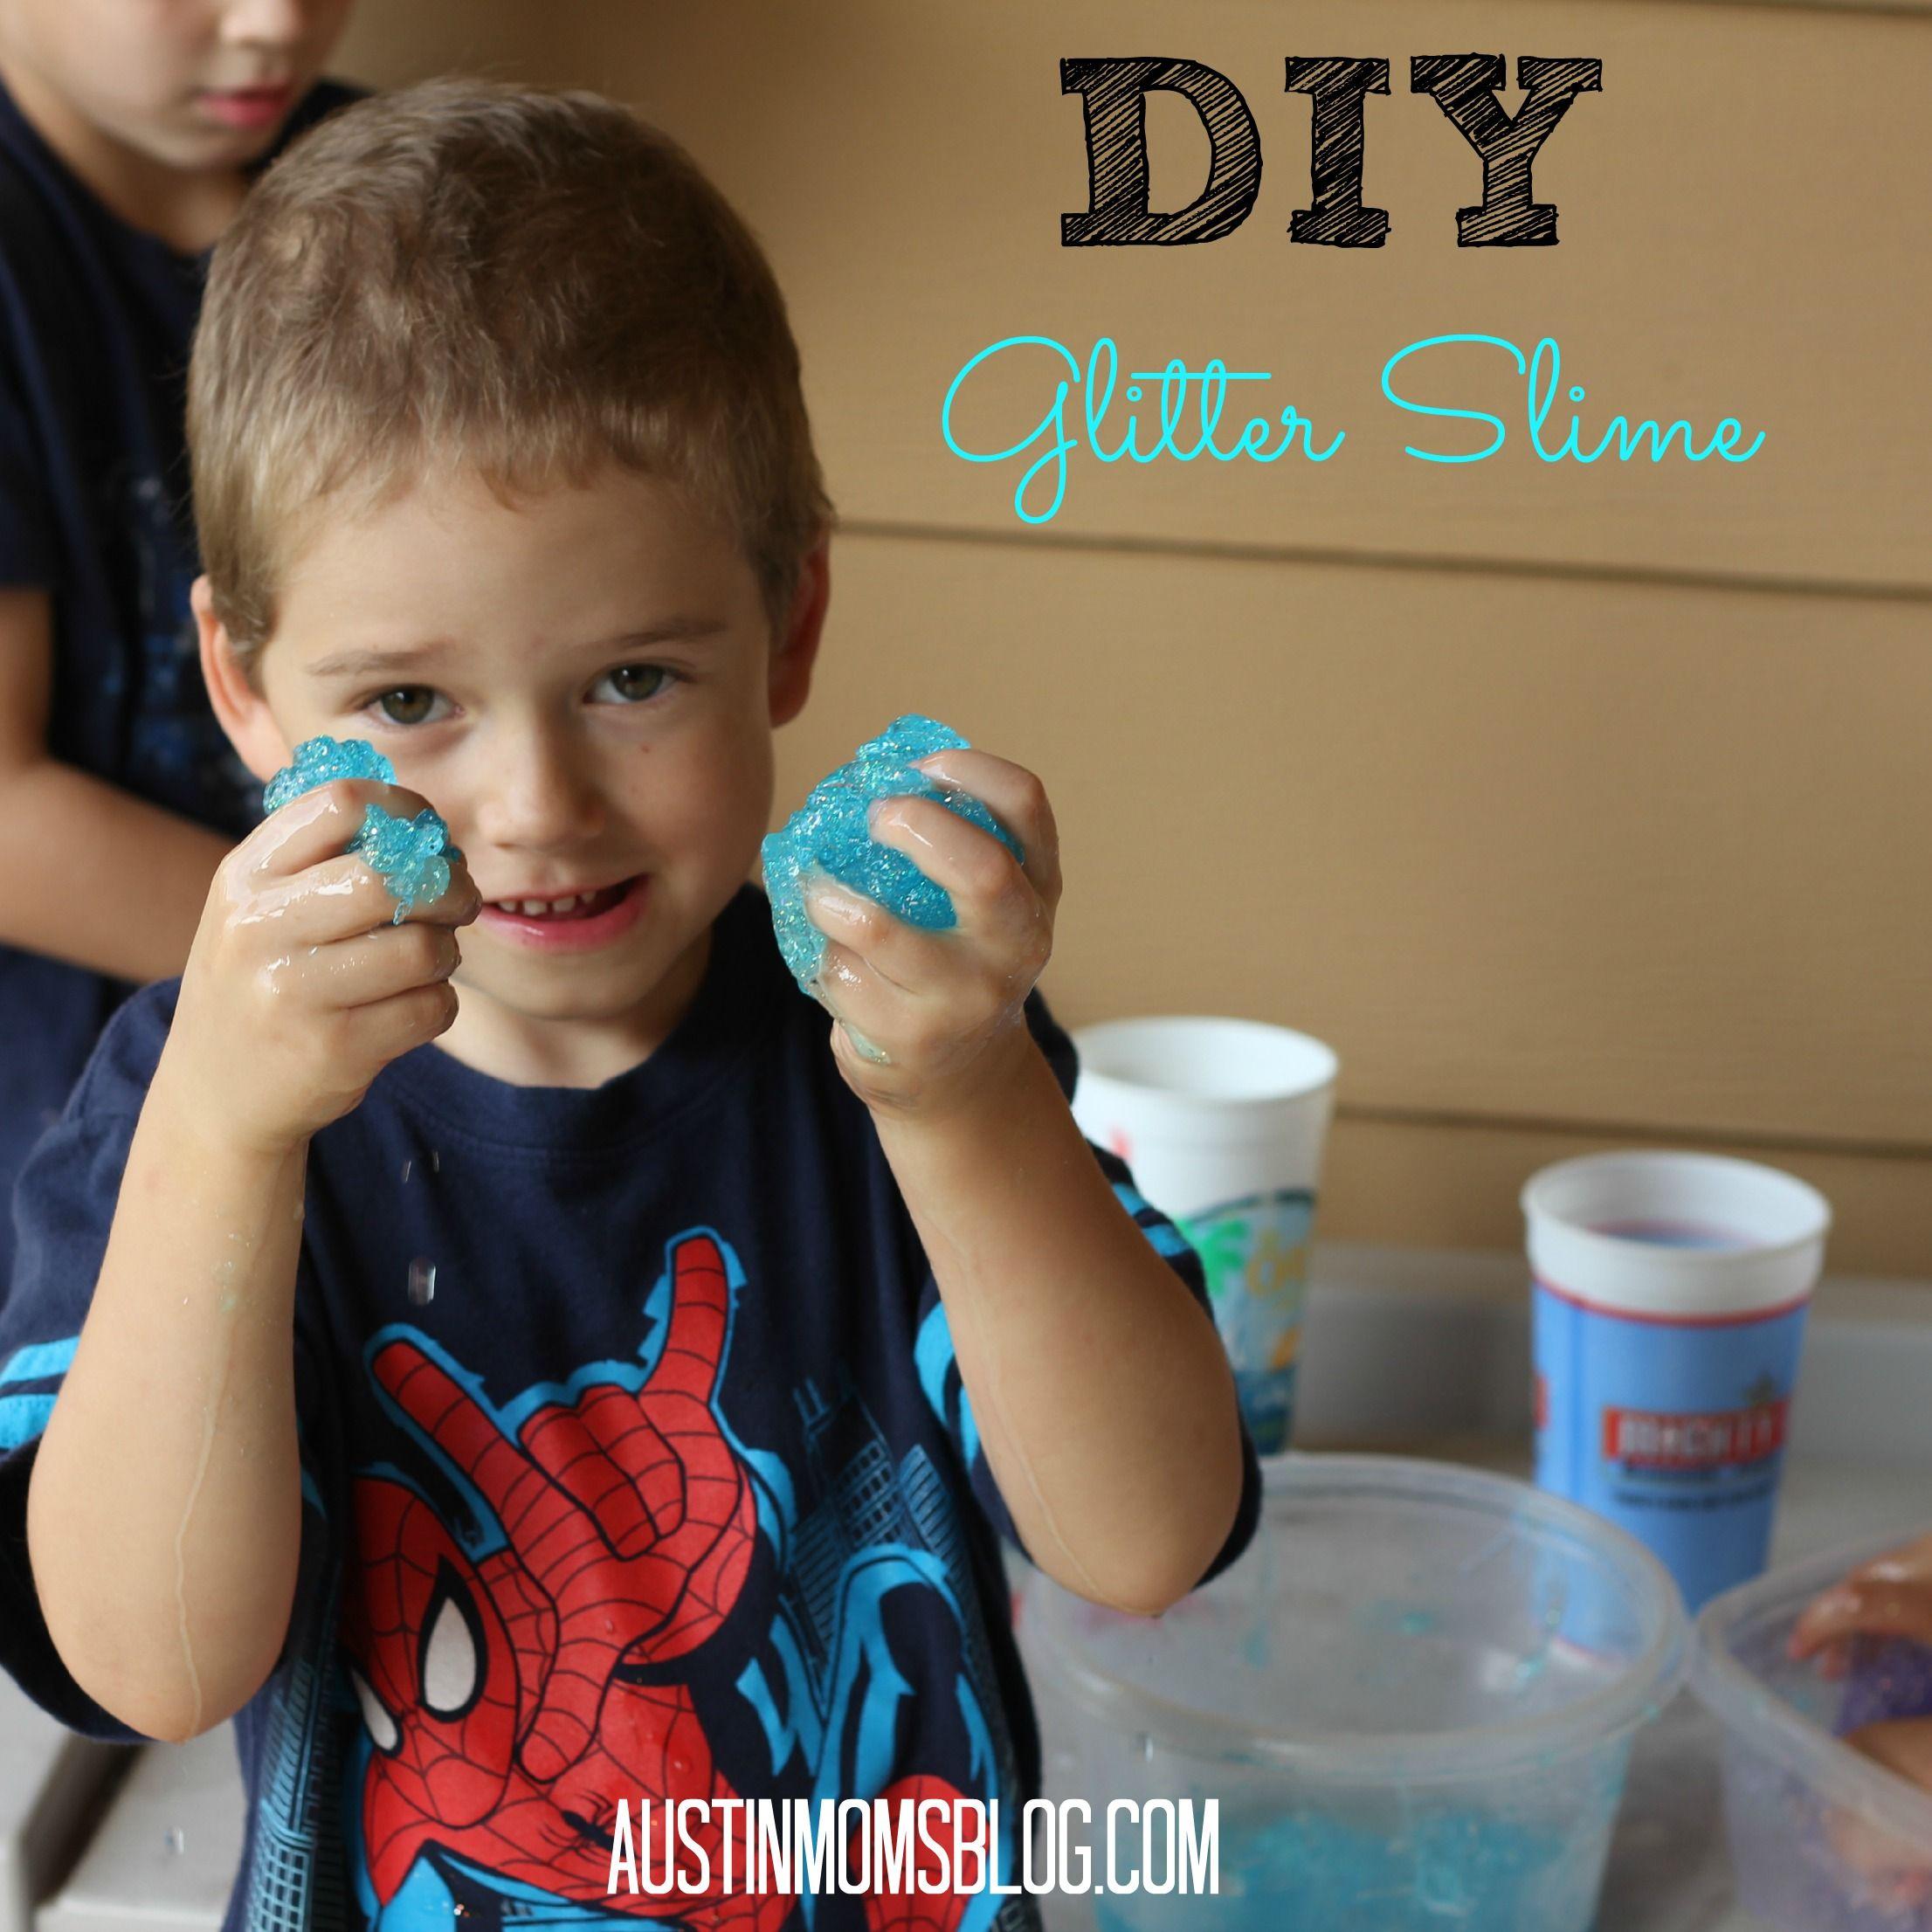 Gloomy Day Activities | Austin Moms Blog | DIY Glitter Slime